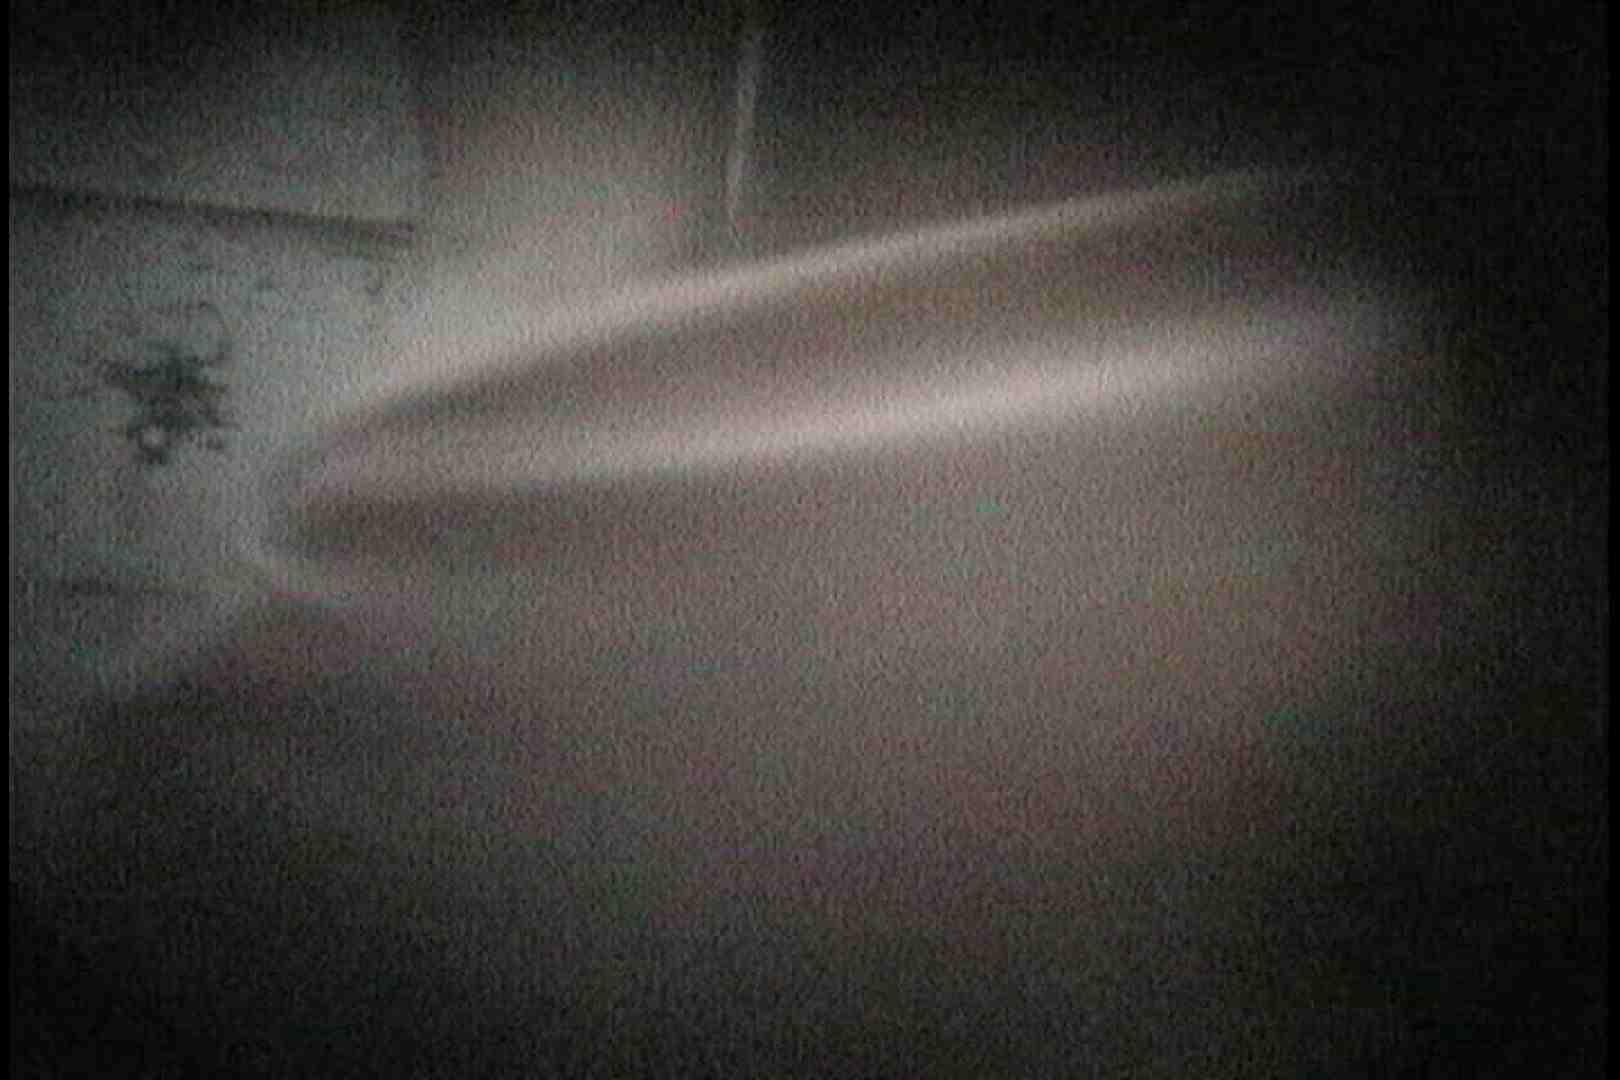 No.68 見事に可愛い巨乳ちゃん 室内暗いです シャワー室 AV動画キャプチャ 79枚 69